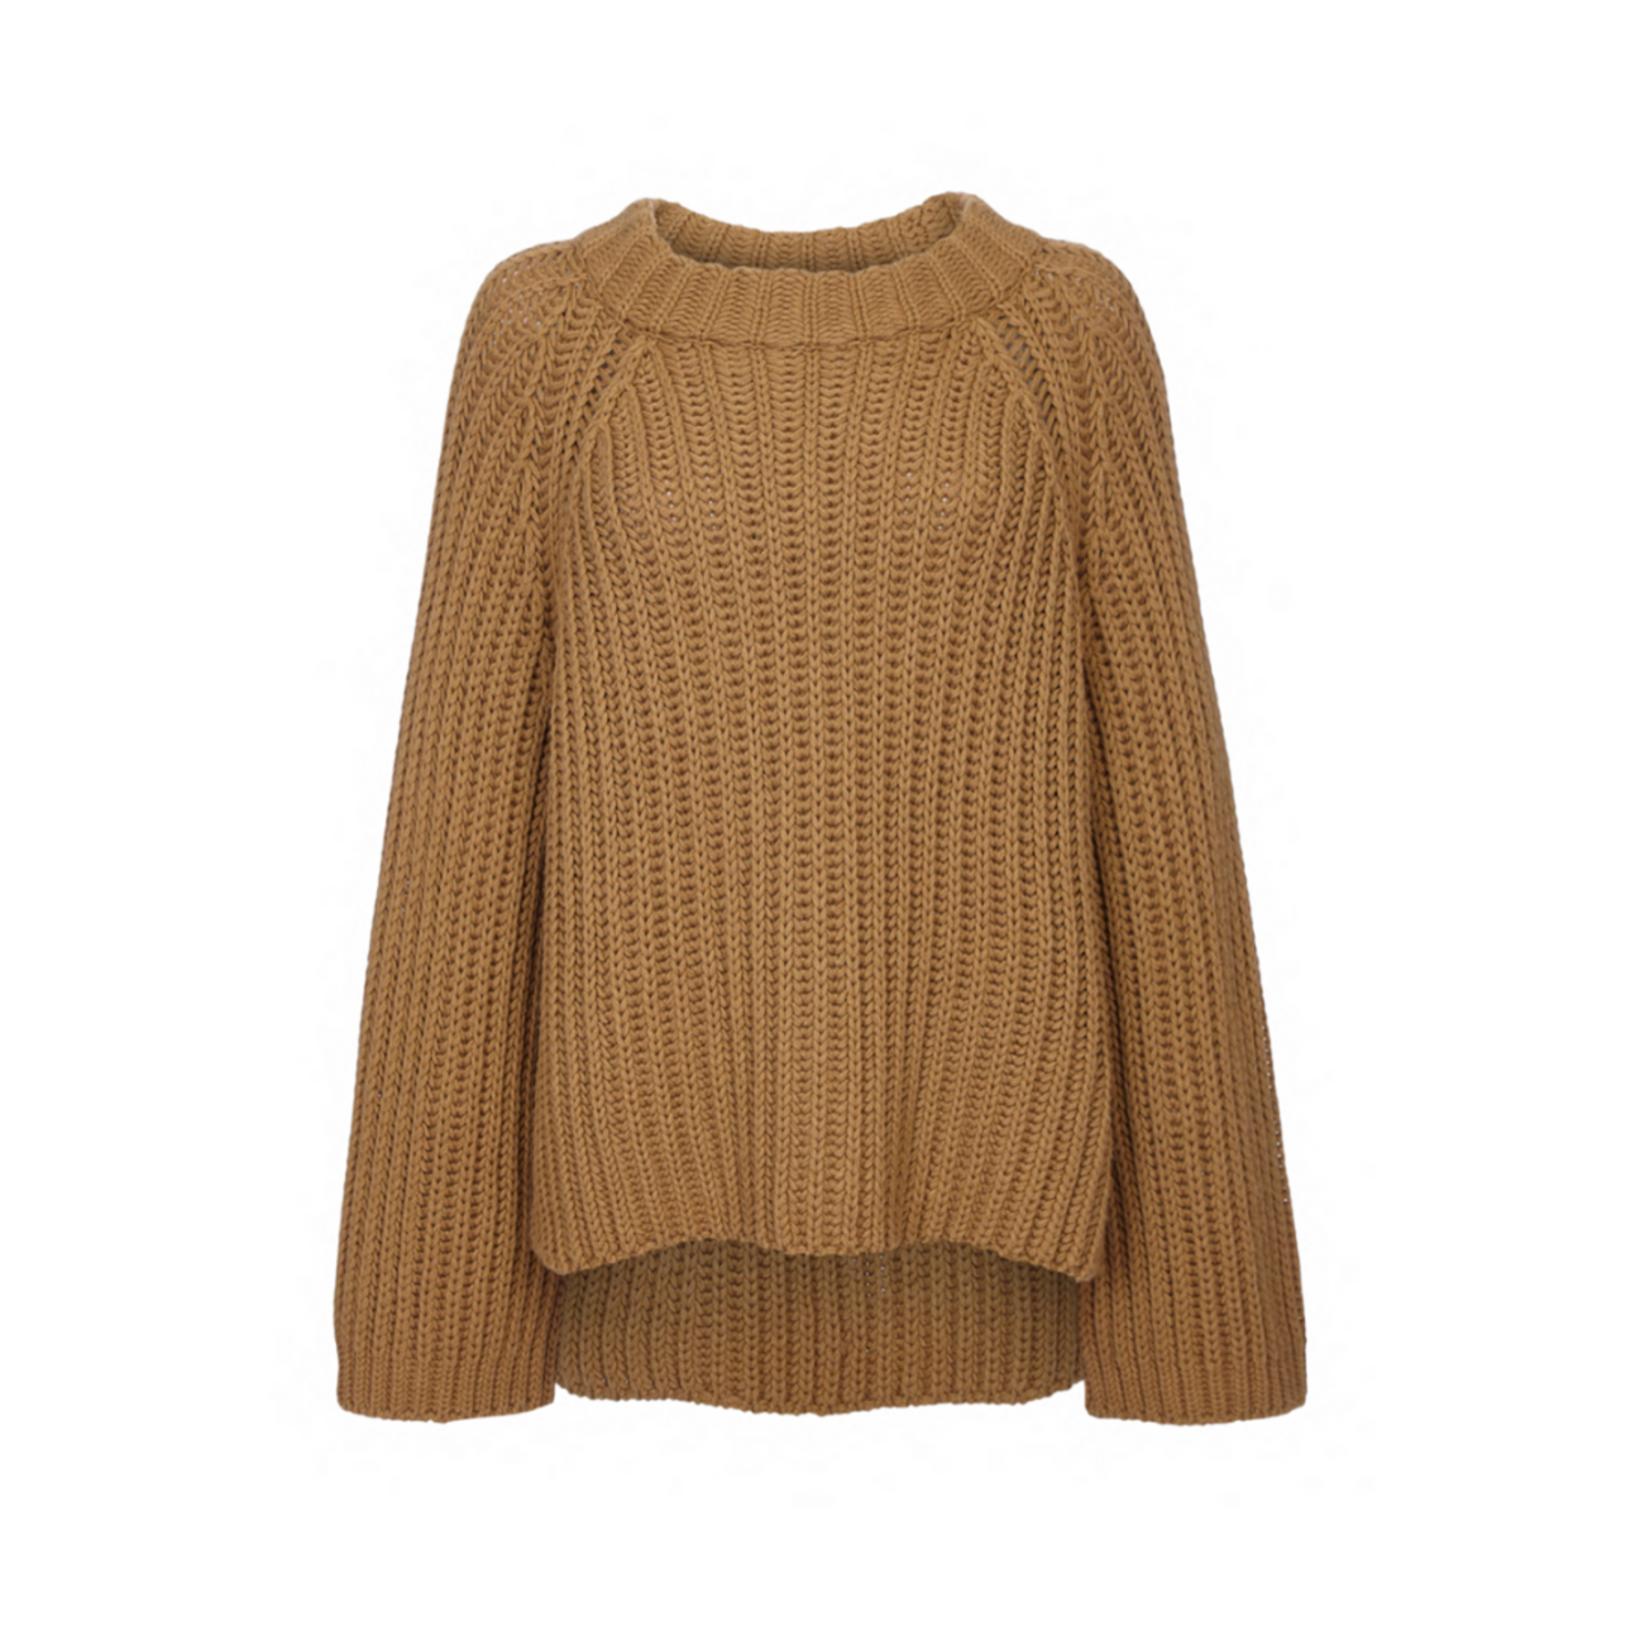 Arjé The Steph Cashmere Blend Rib Neck Open Sweater